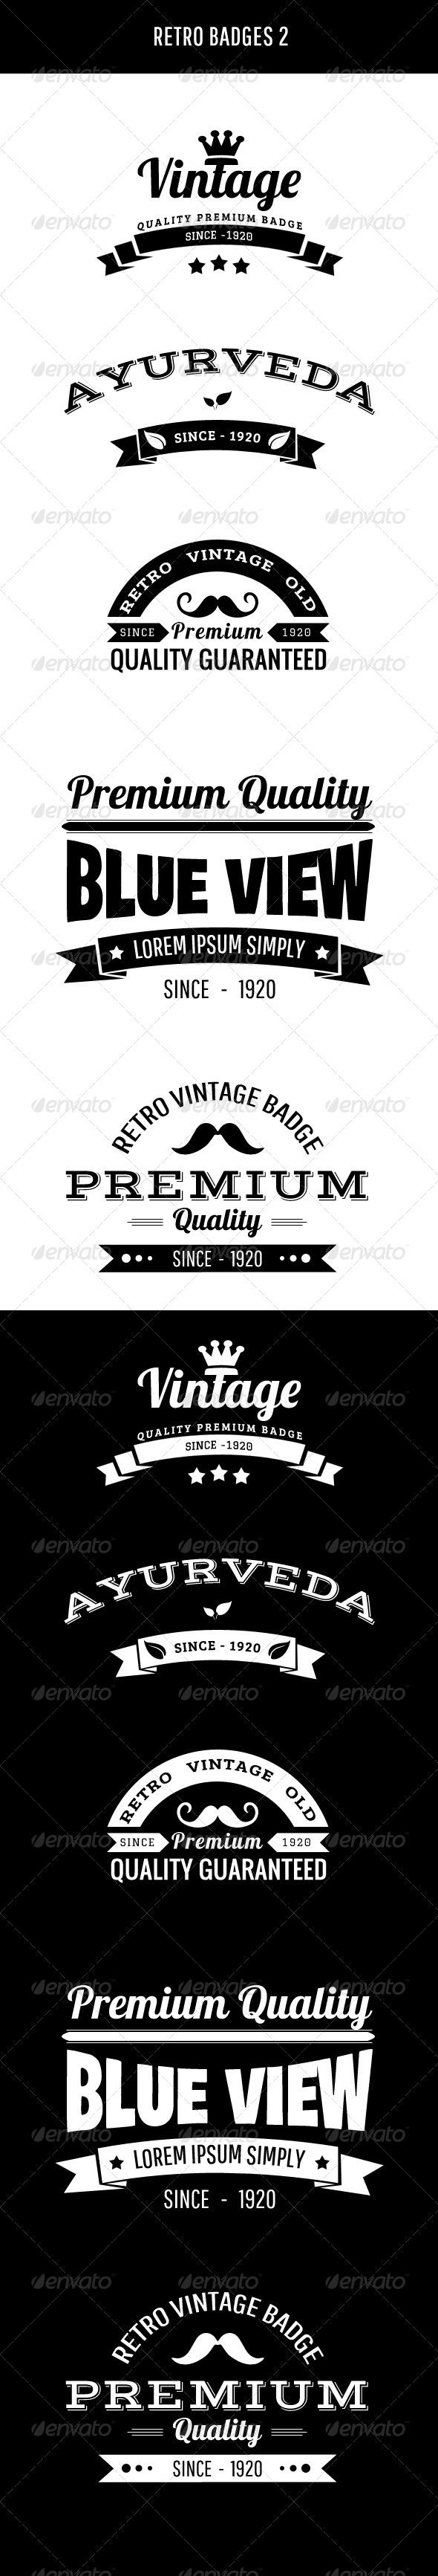 Retro Badges 2 - Badges & Stickers Web Elements